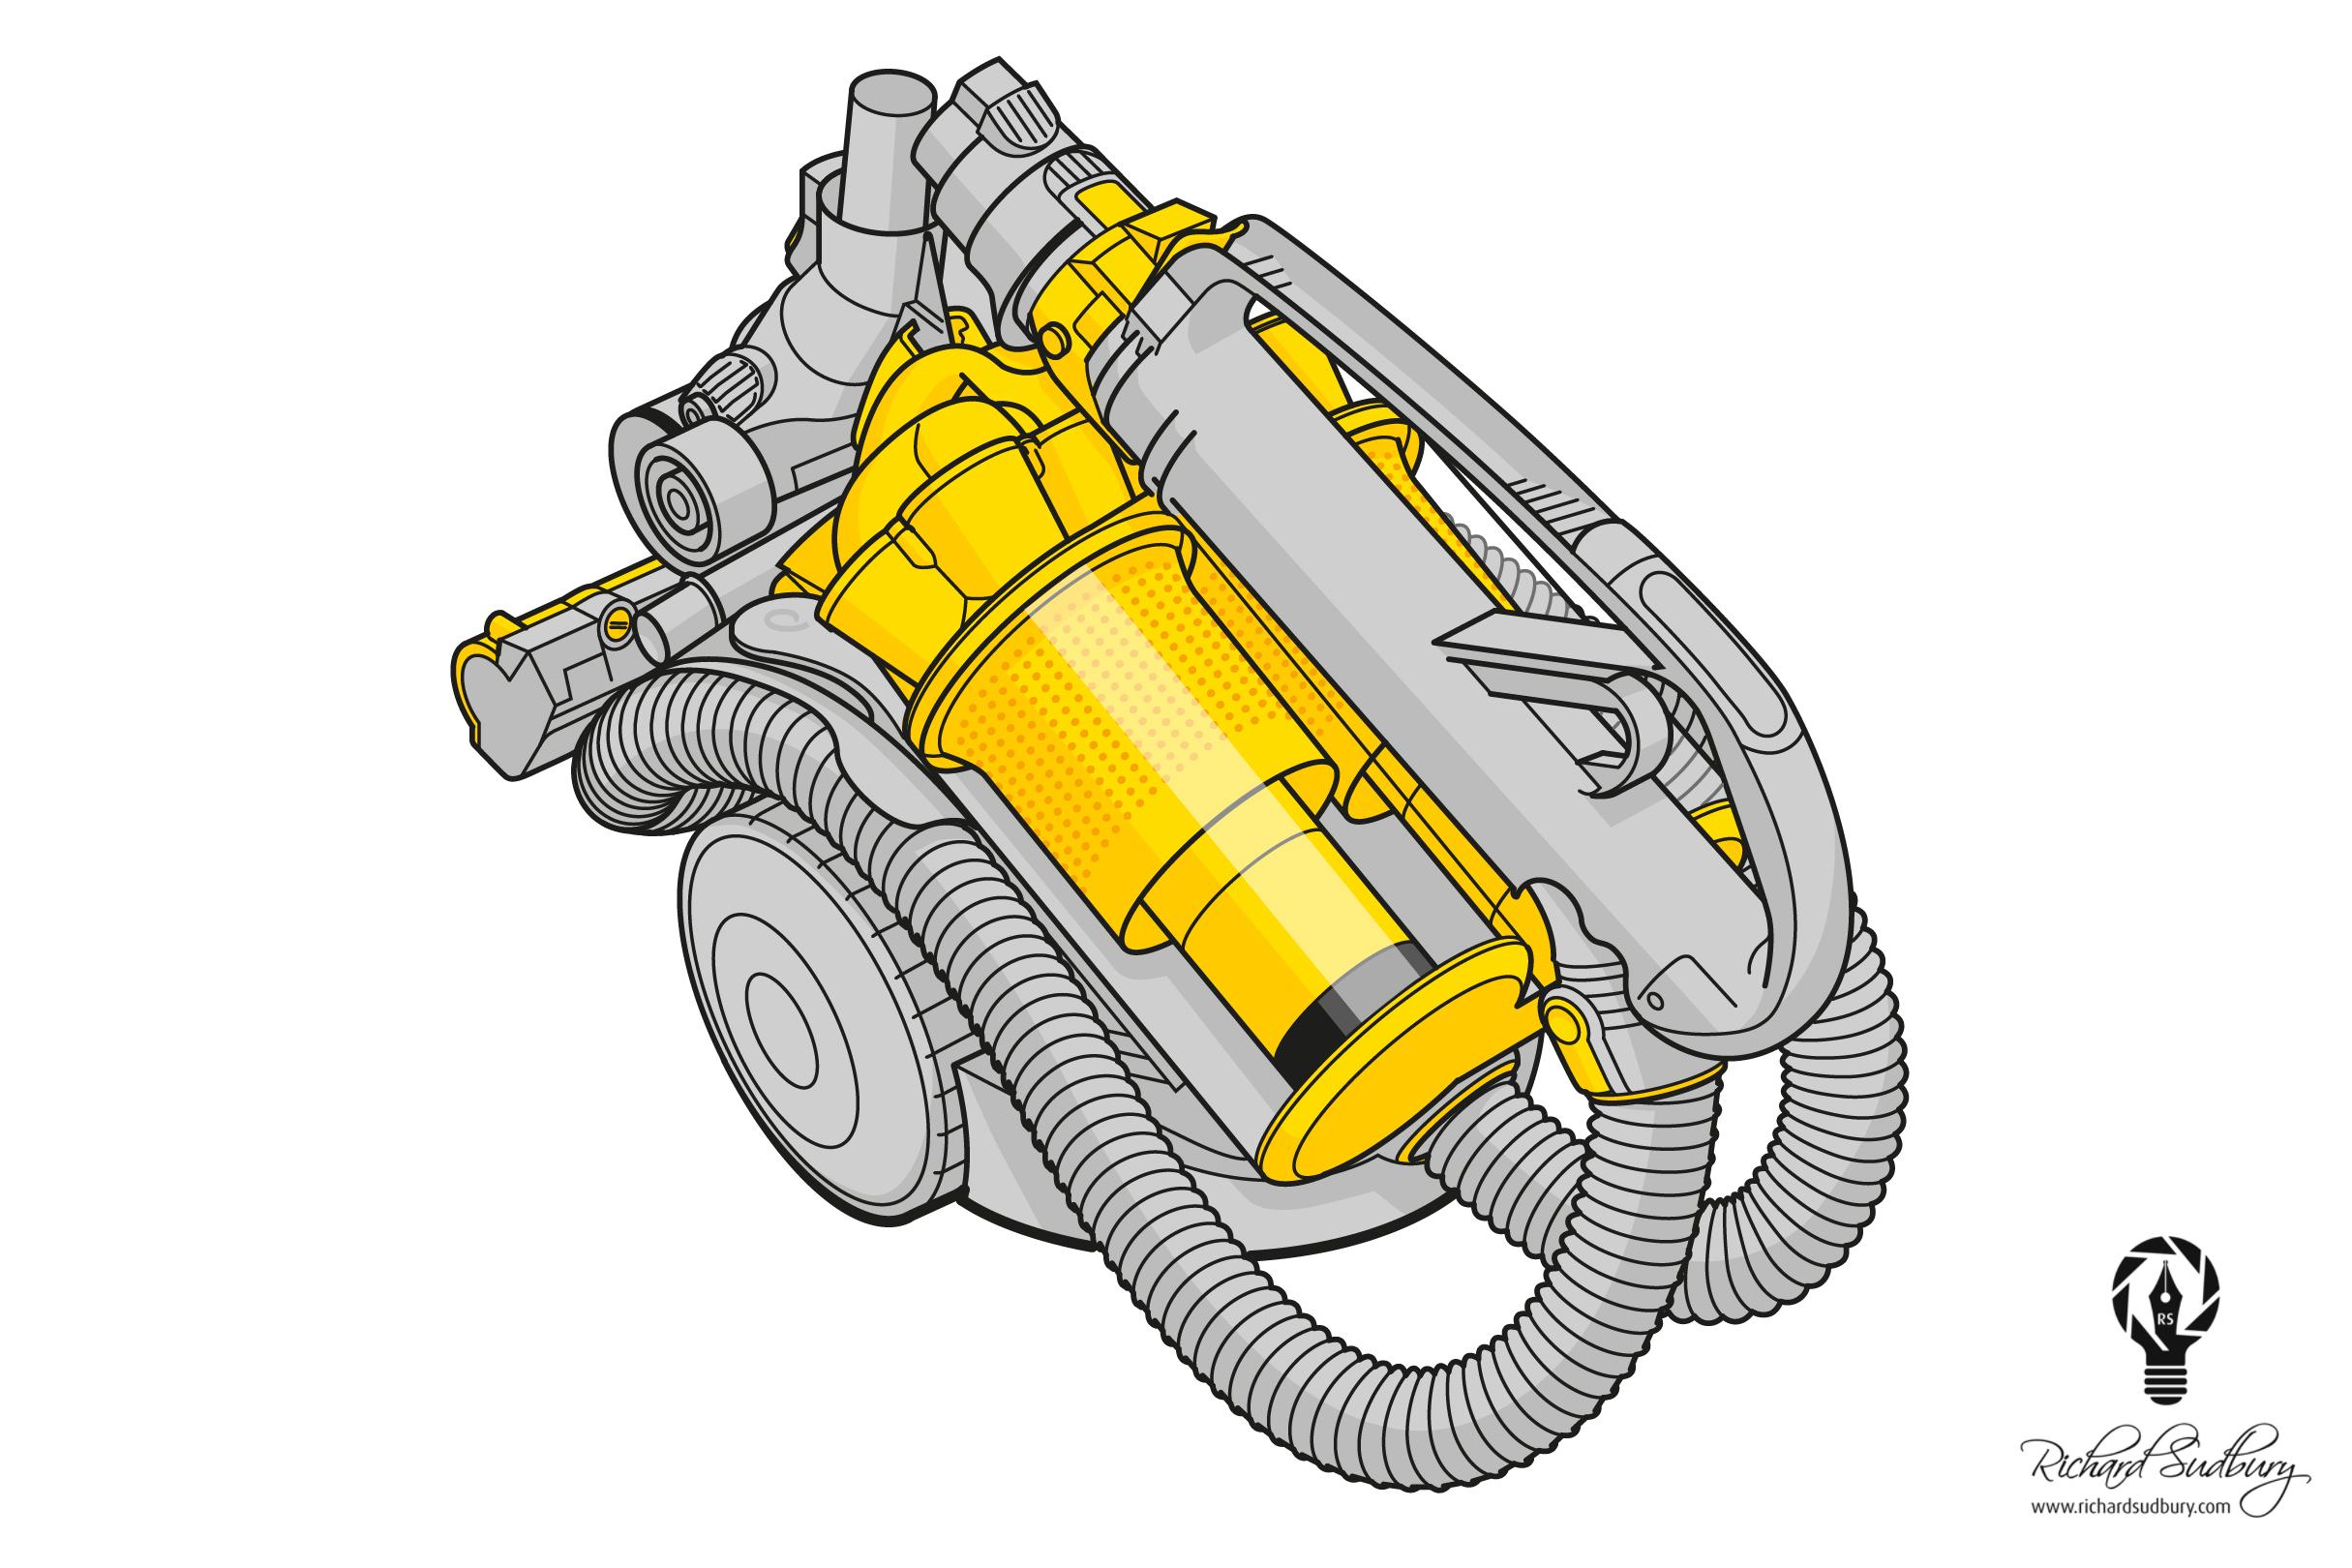 Dyson Technical Illustration